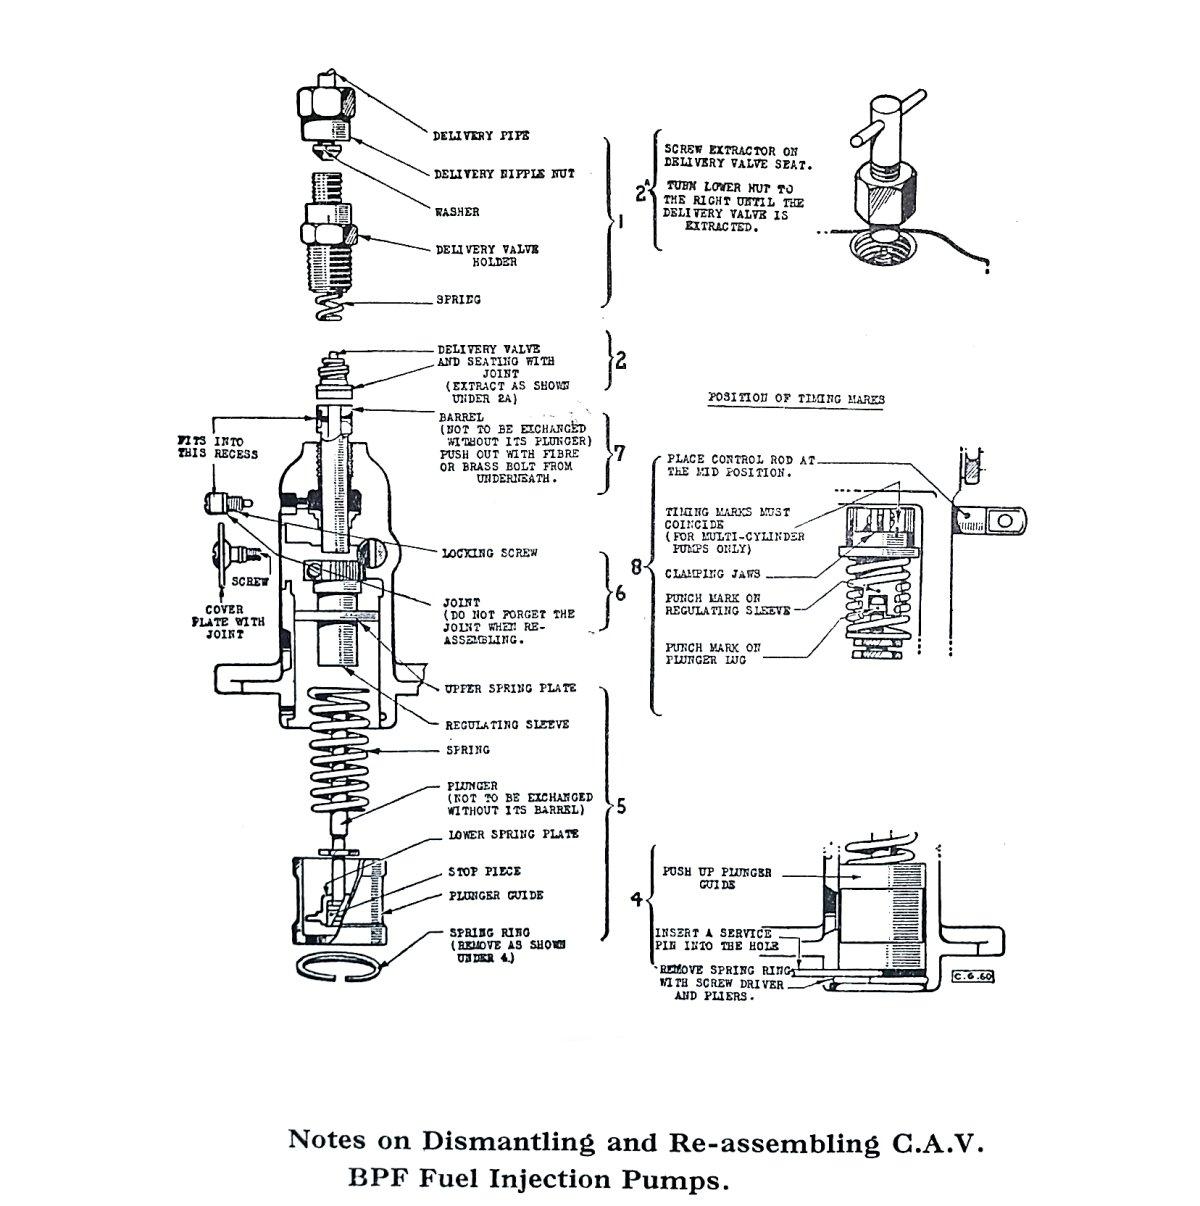 Cav Bpf 2b Fuel Injection Pump Exploded Parts Diagram